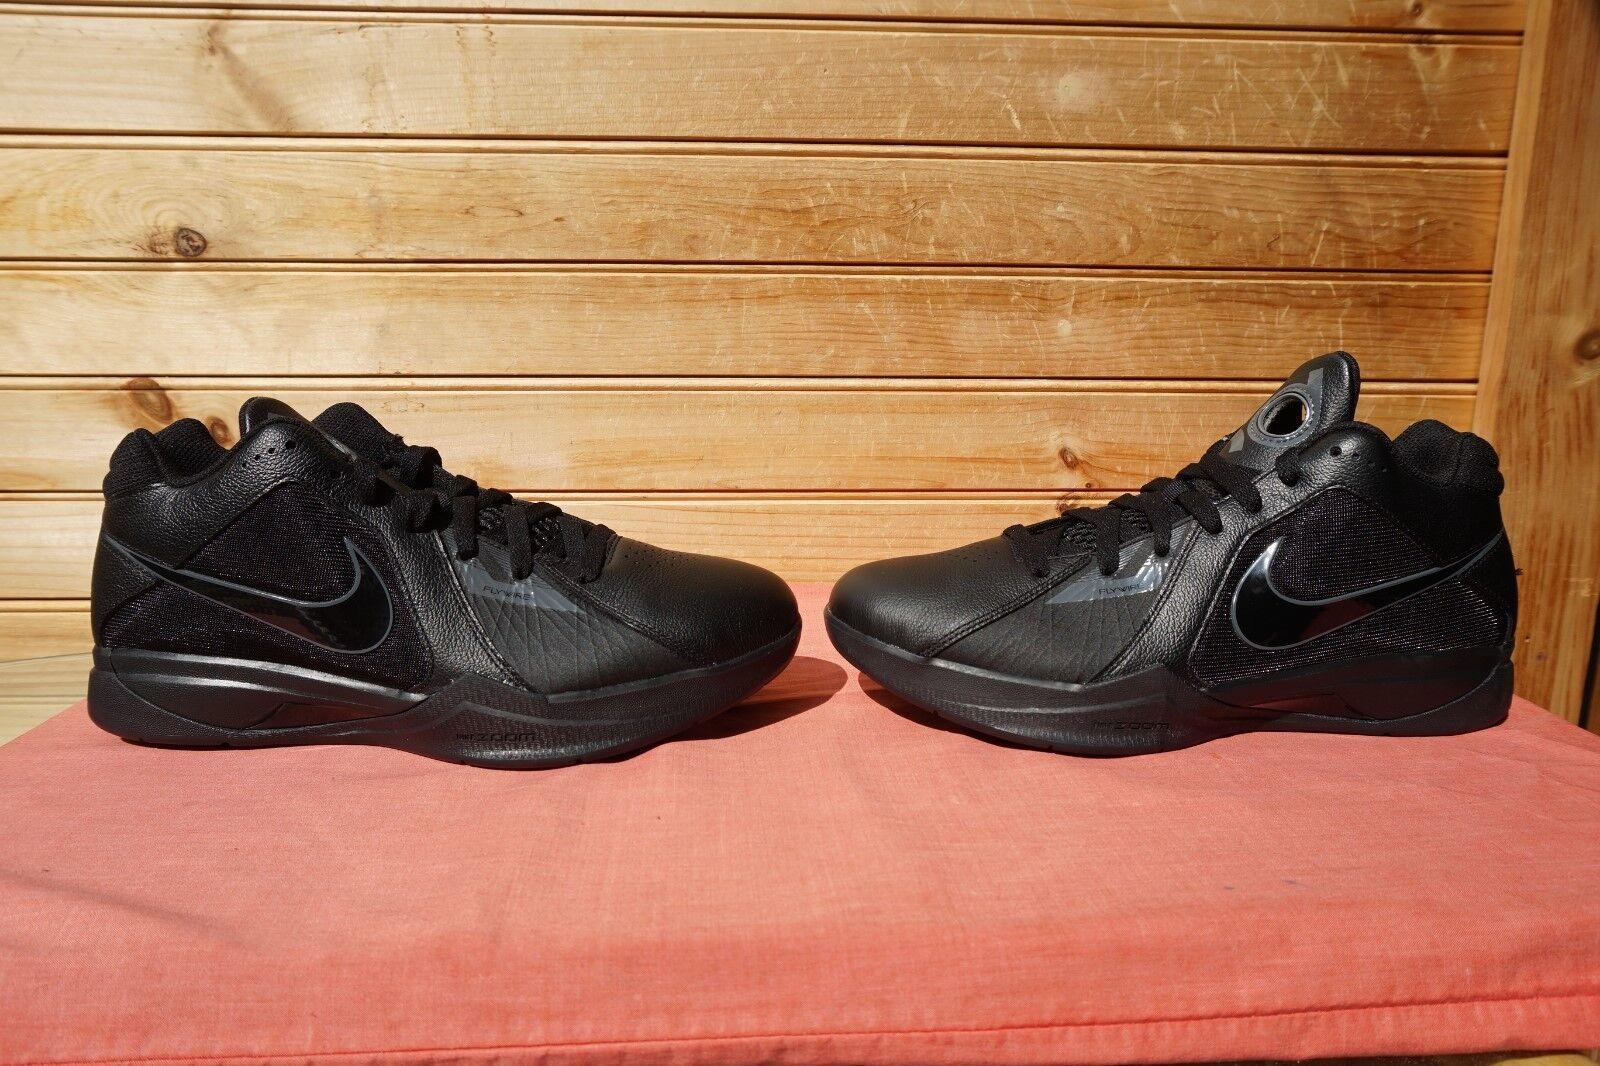 2018 Nike KD 3 Blackout Black Dark Grey Sz 8 (L923) 417279-002